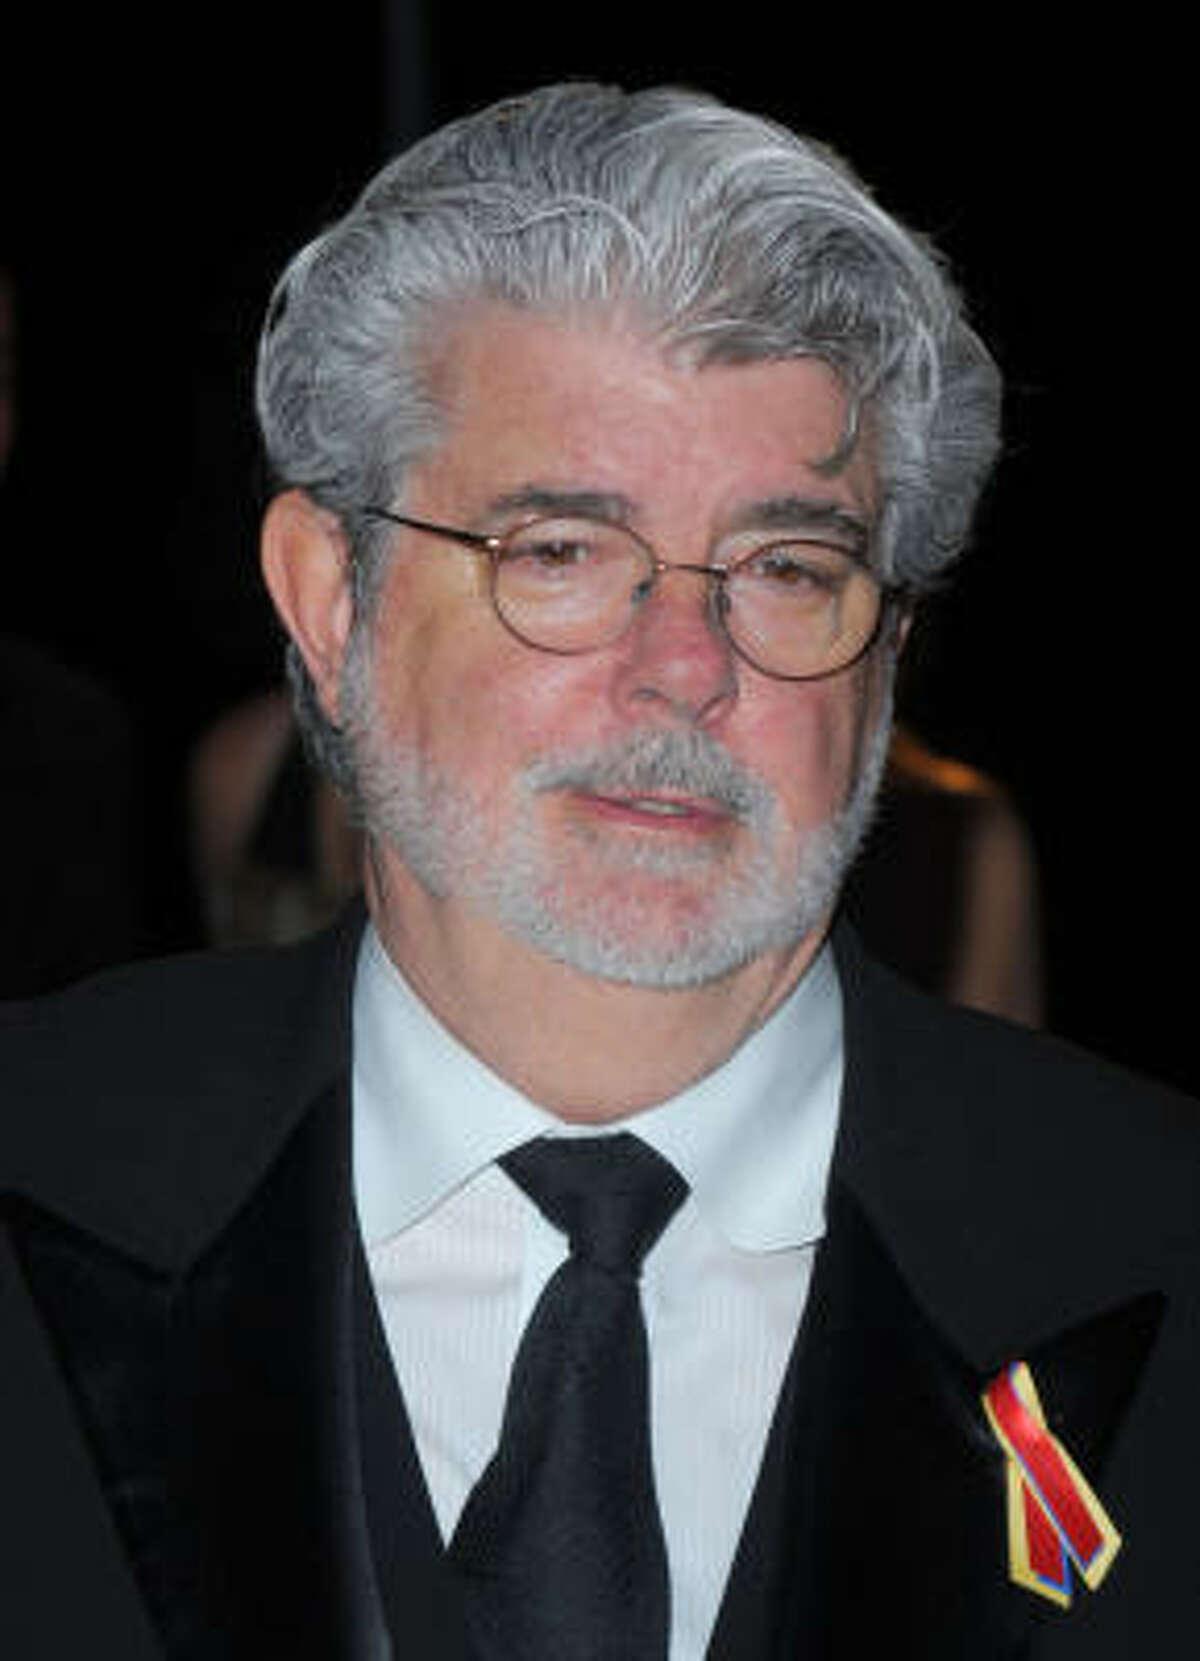 8. George Lucas $95 million